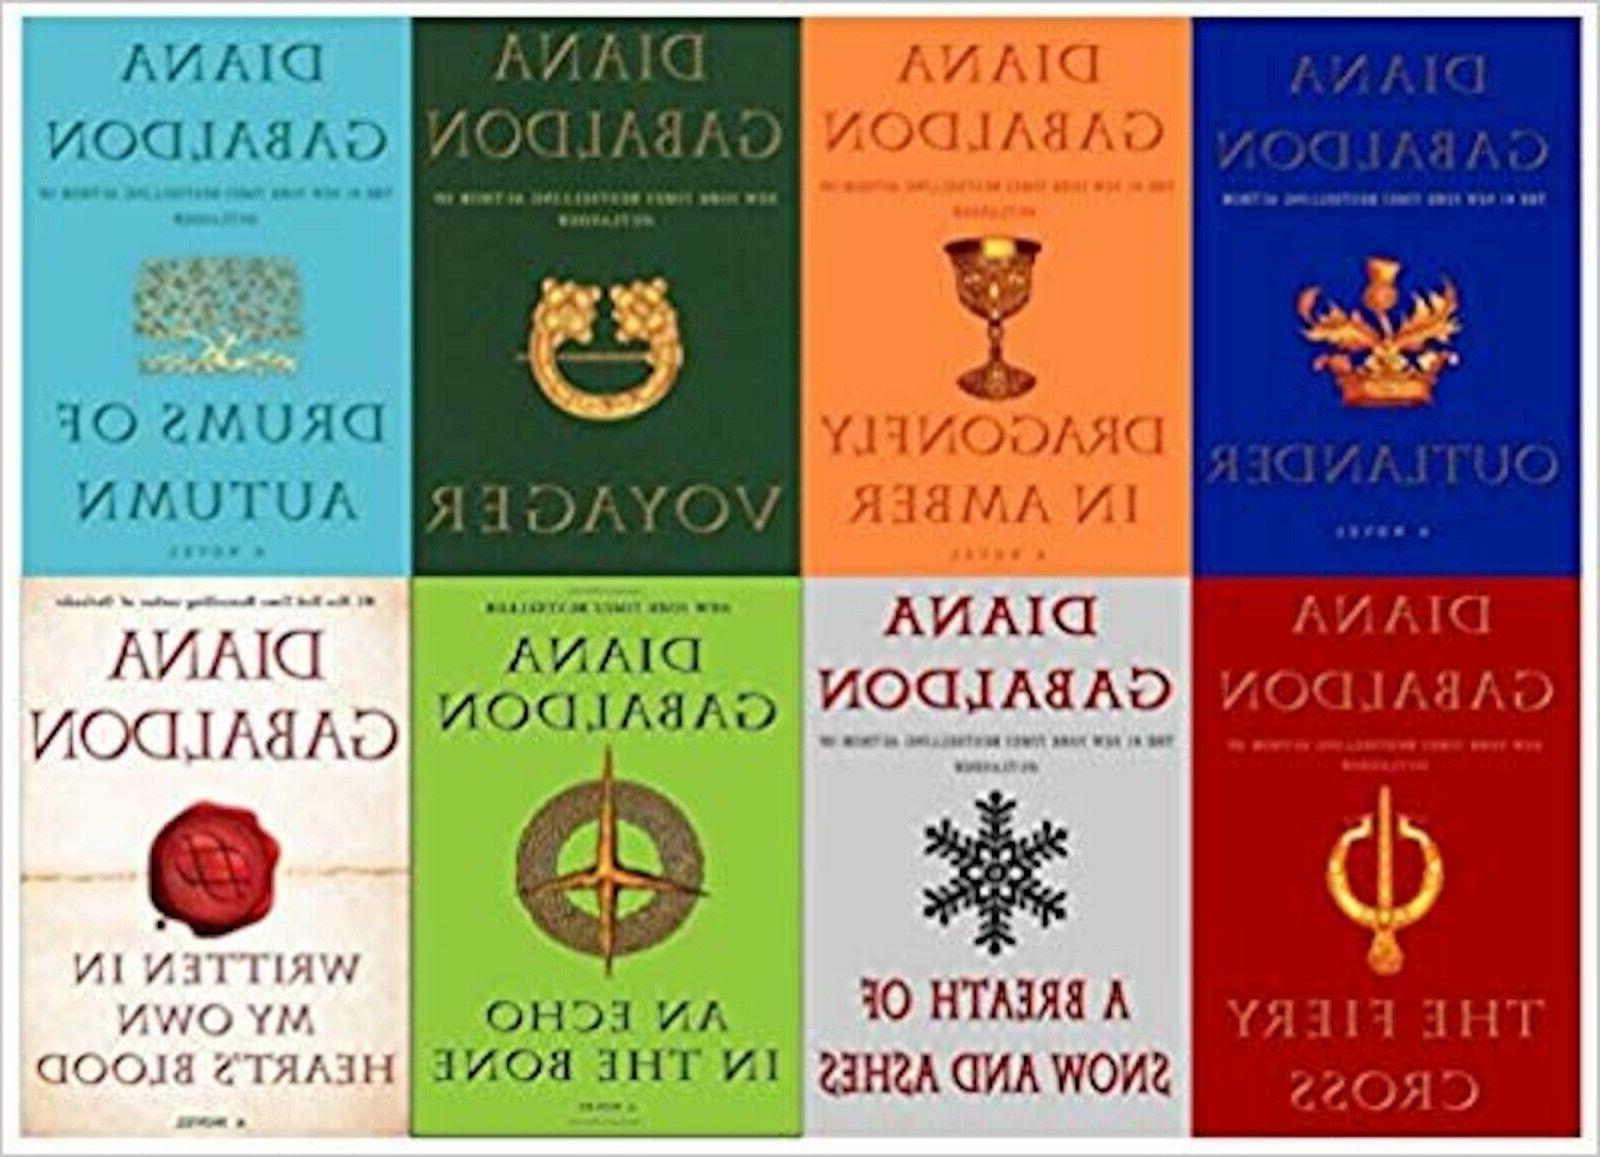 outlander series volumes 1 8 book set